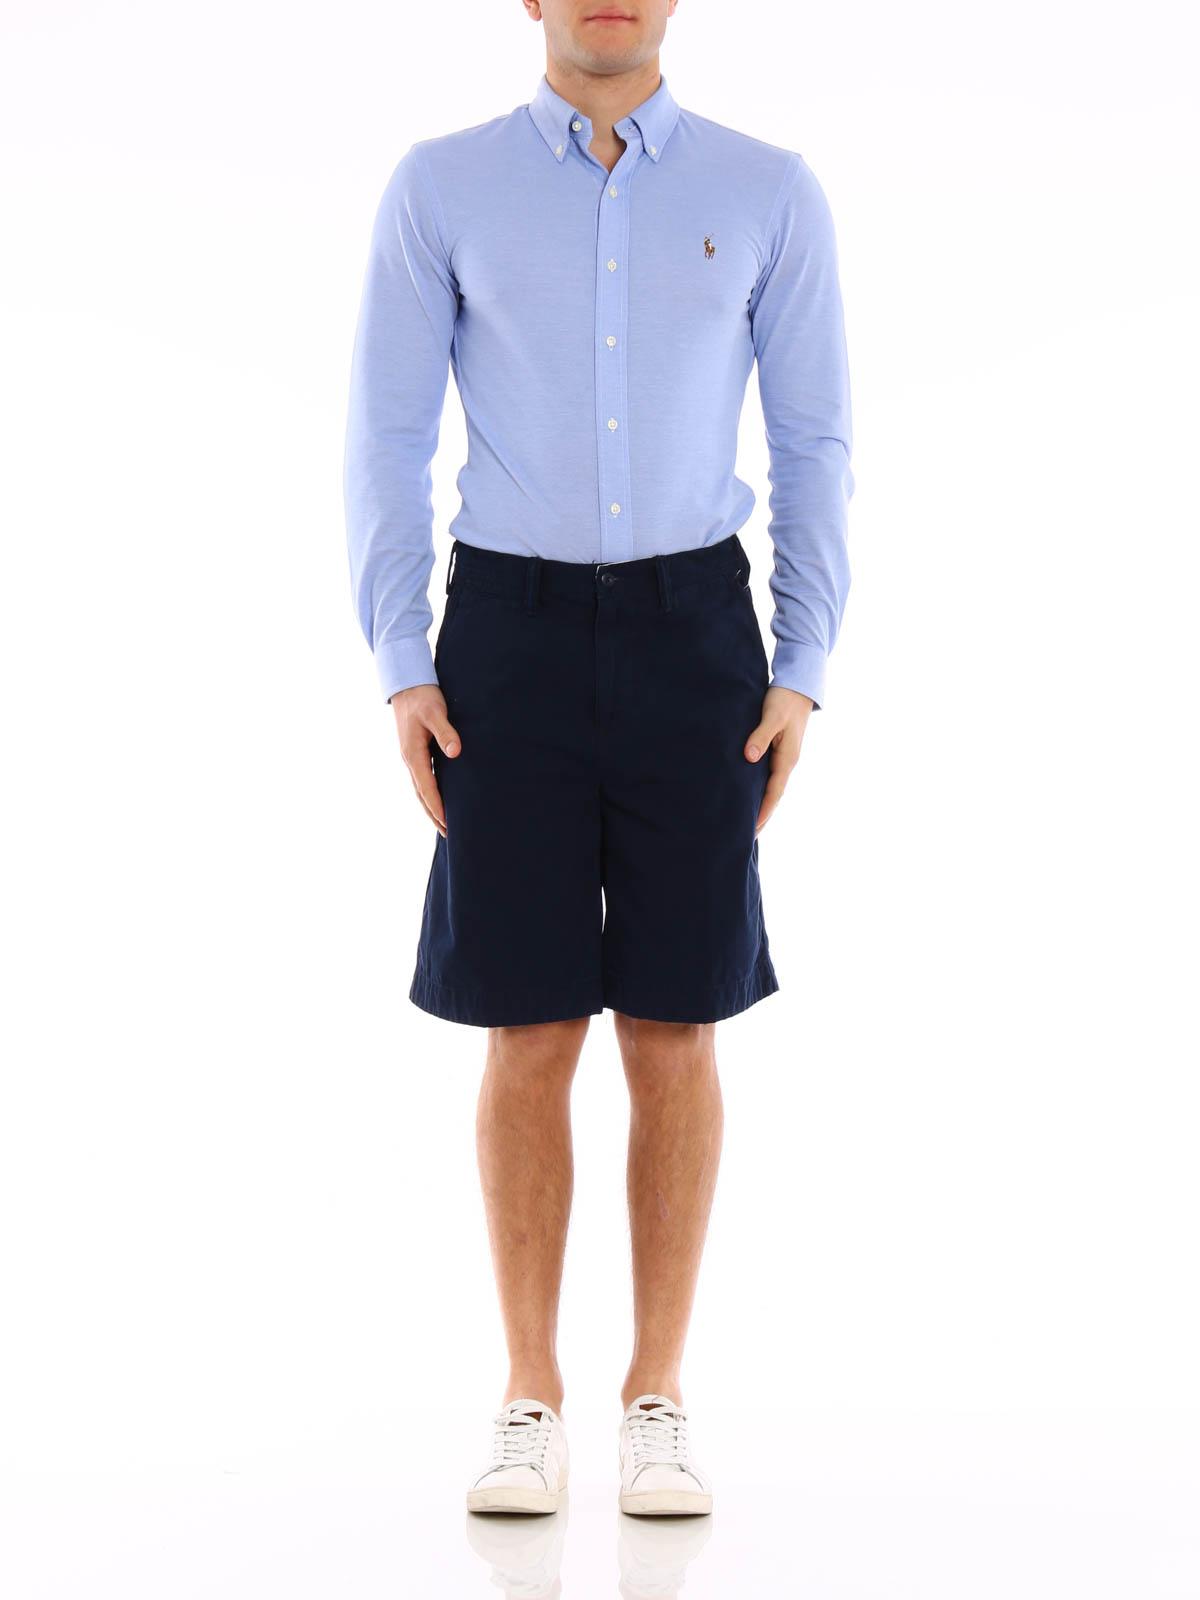 4499 A22hs516c4249 Pour Shorts Bleu Short Homme Lauren Polo Ralph u3cF5TlJK1